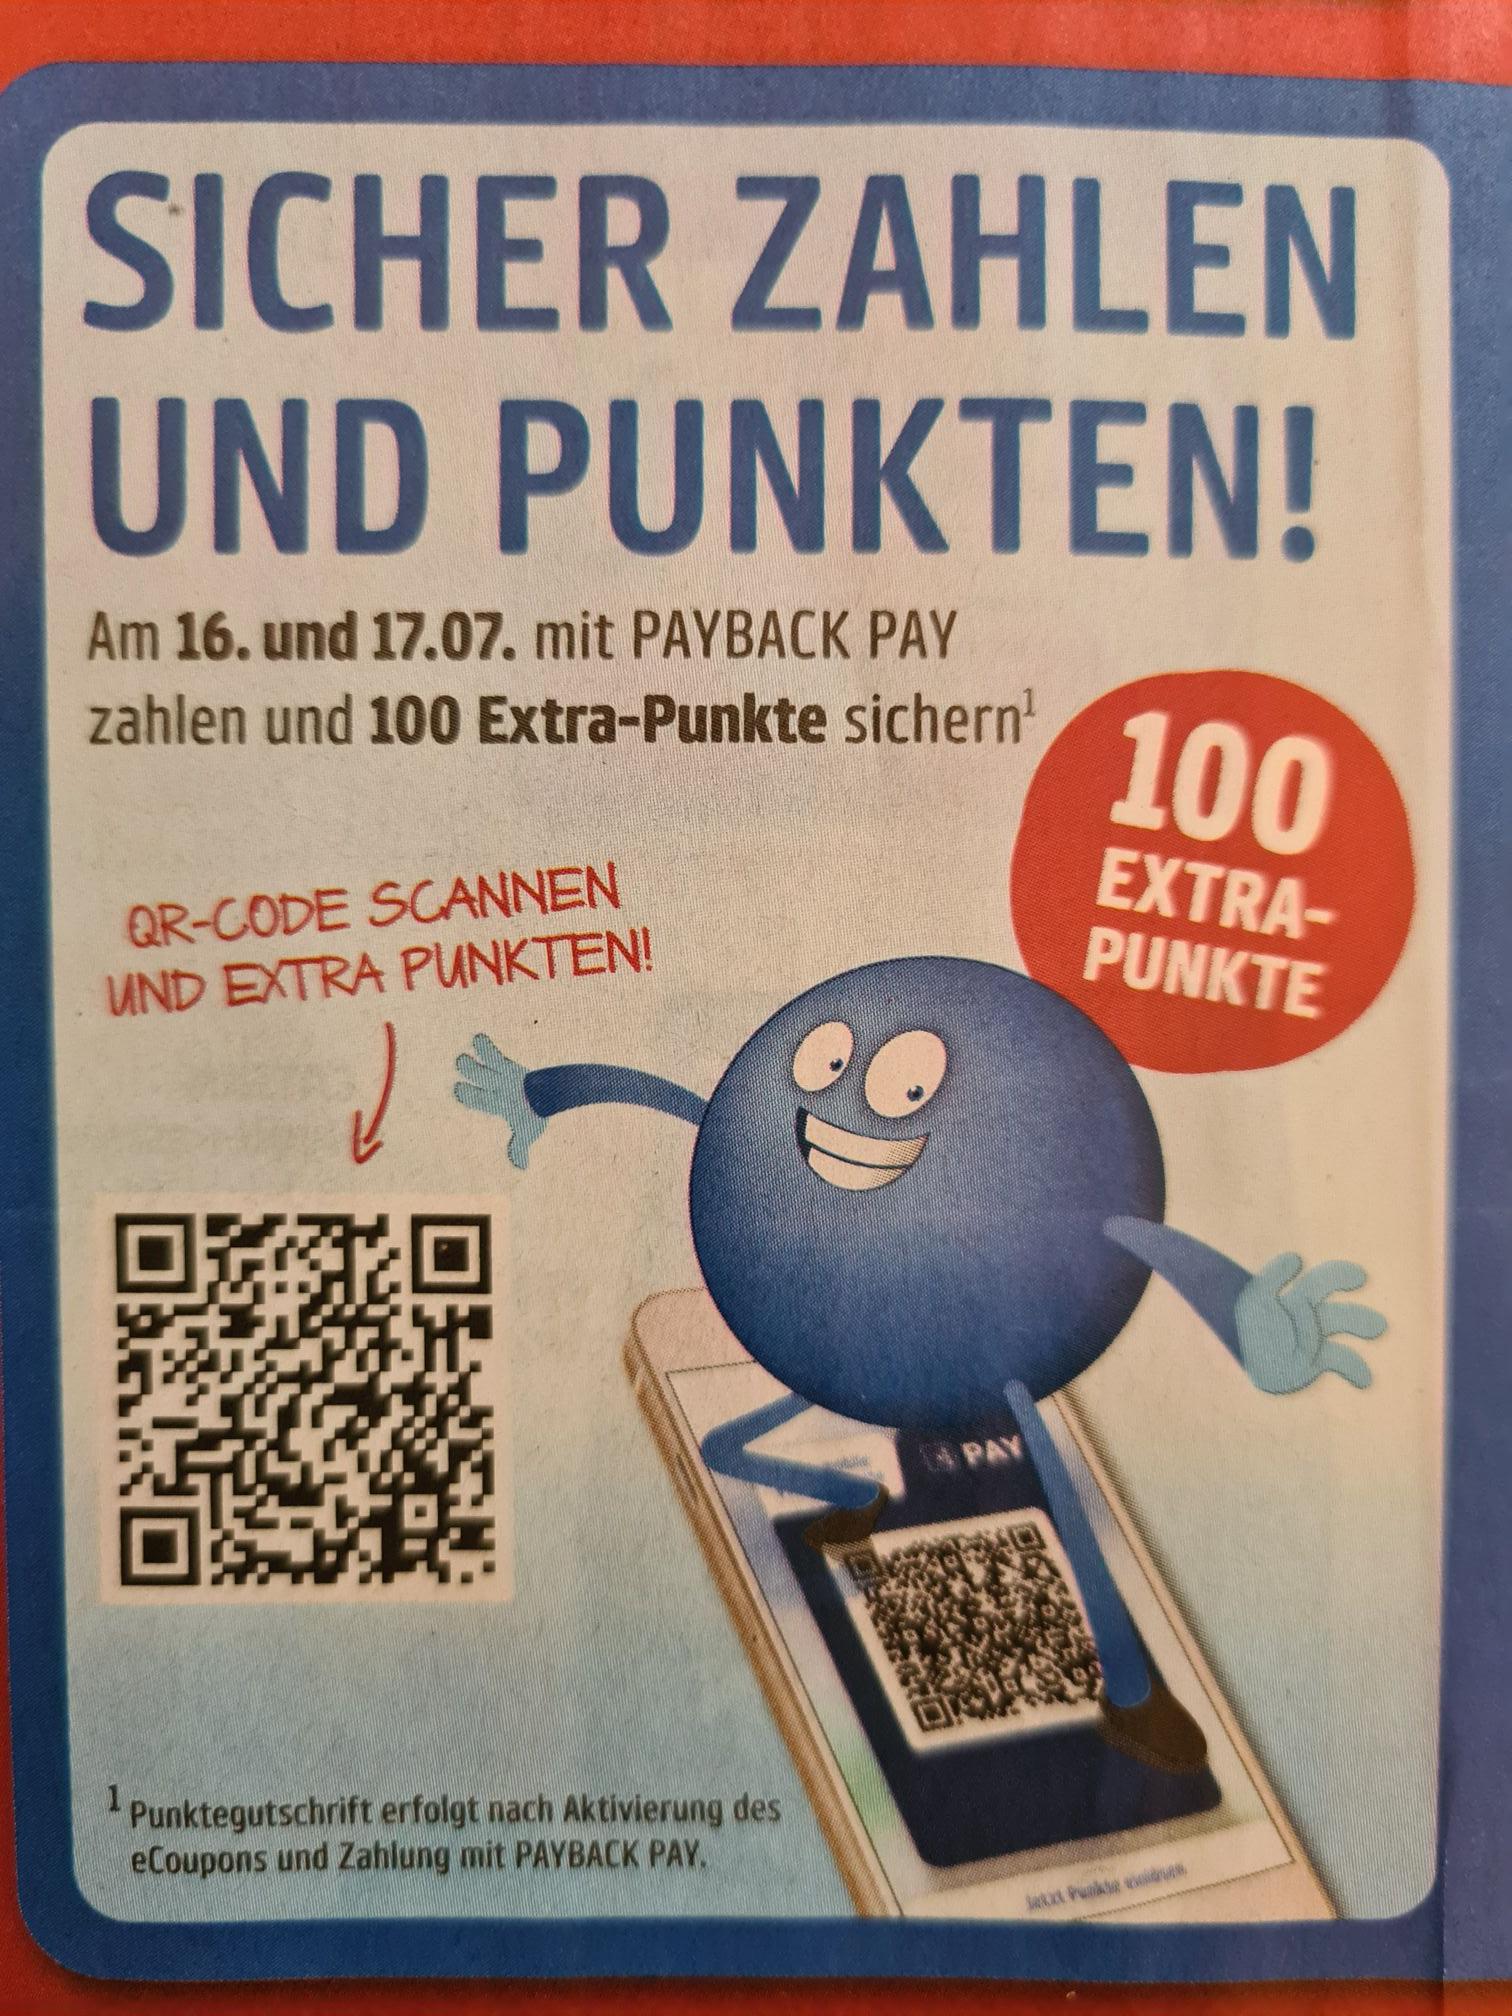 [Penny / Payback Pay] 100 Extra Punkte beim Bezahlen mit Payback Pay bei Penny; Mindestumsatz 2€ (Aktion gültig heute und morgen)